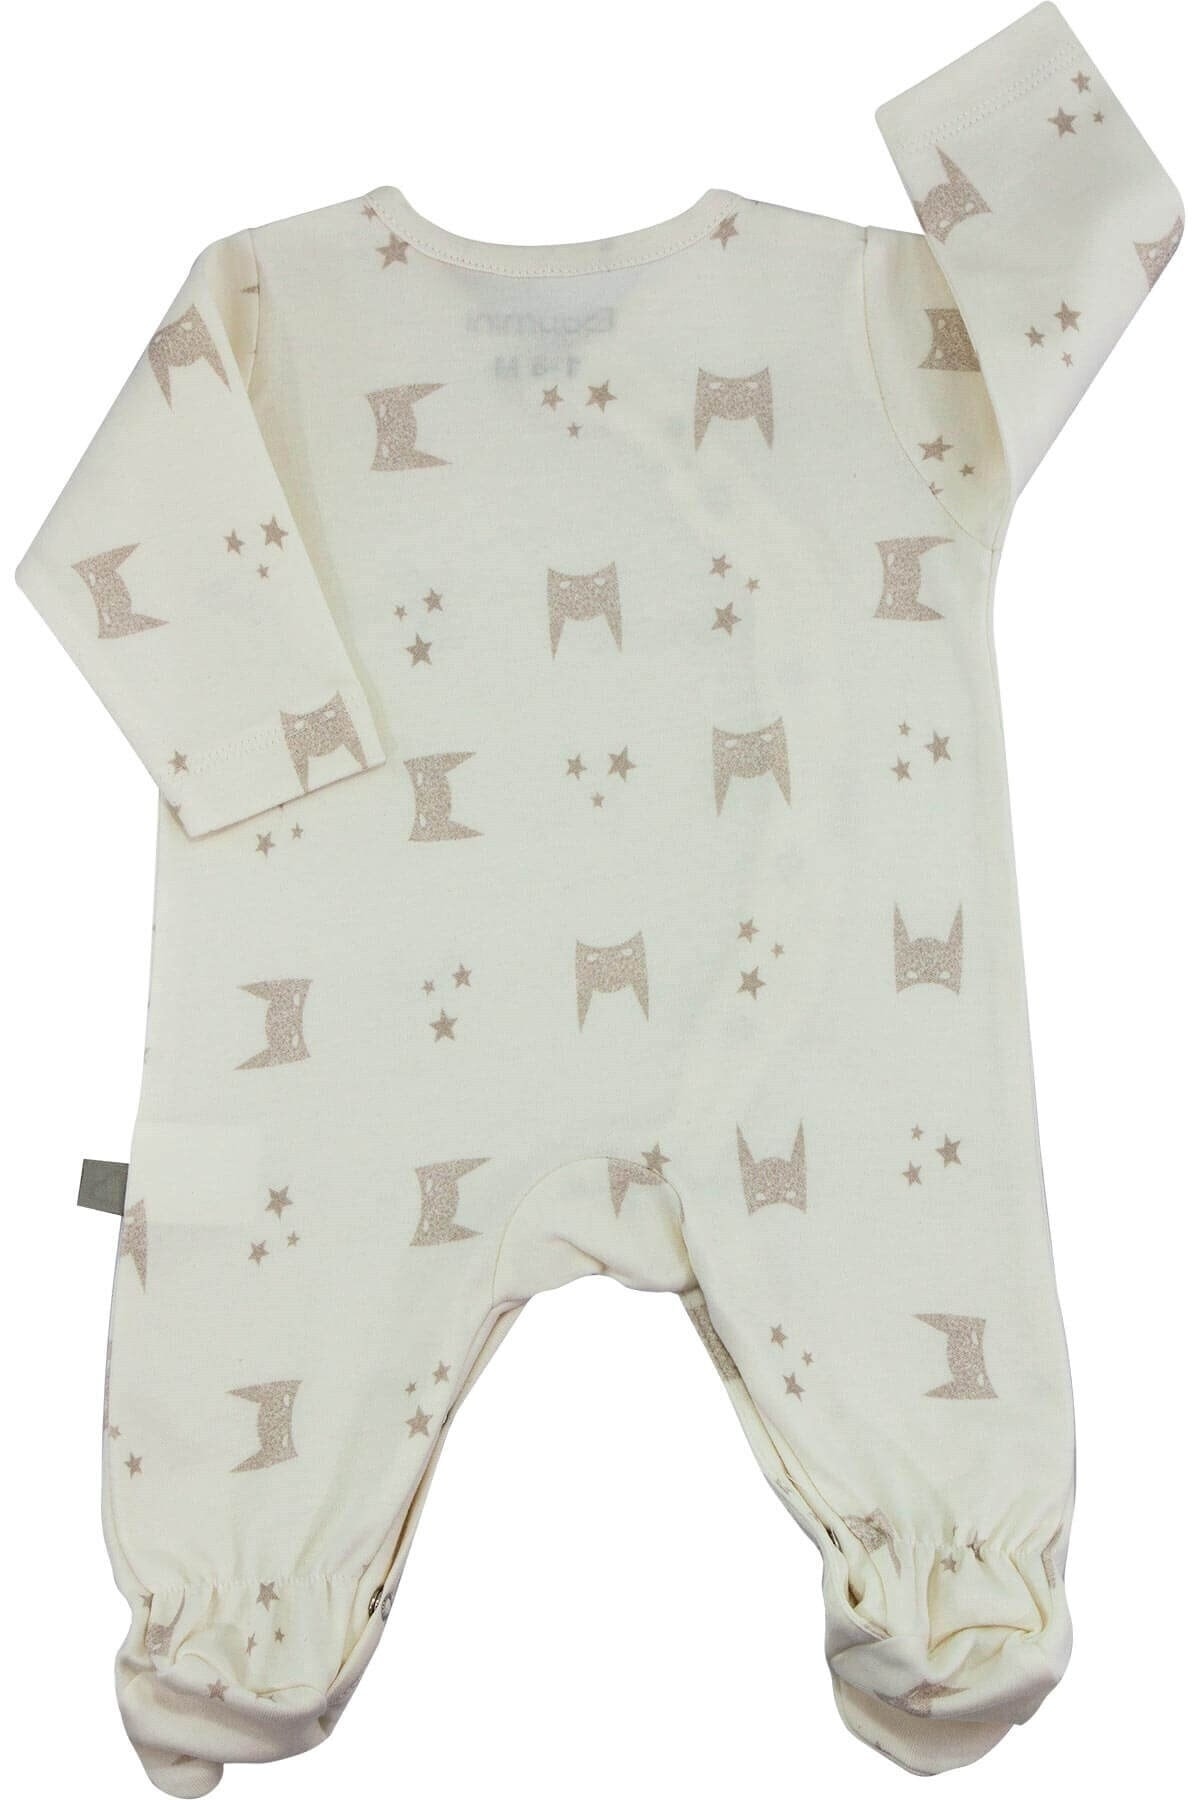 Boumini I Am Batman Yeni Doğan Patikli Bebek Tulumu 0-6 Ay